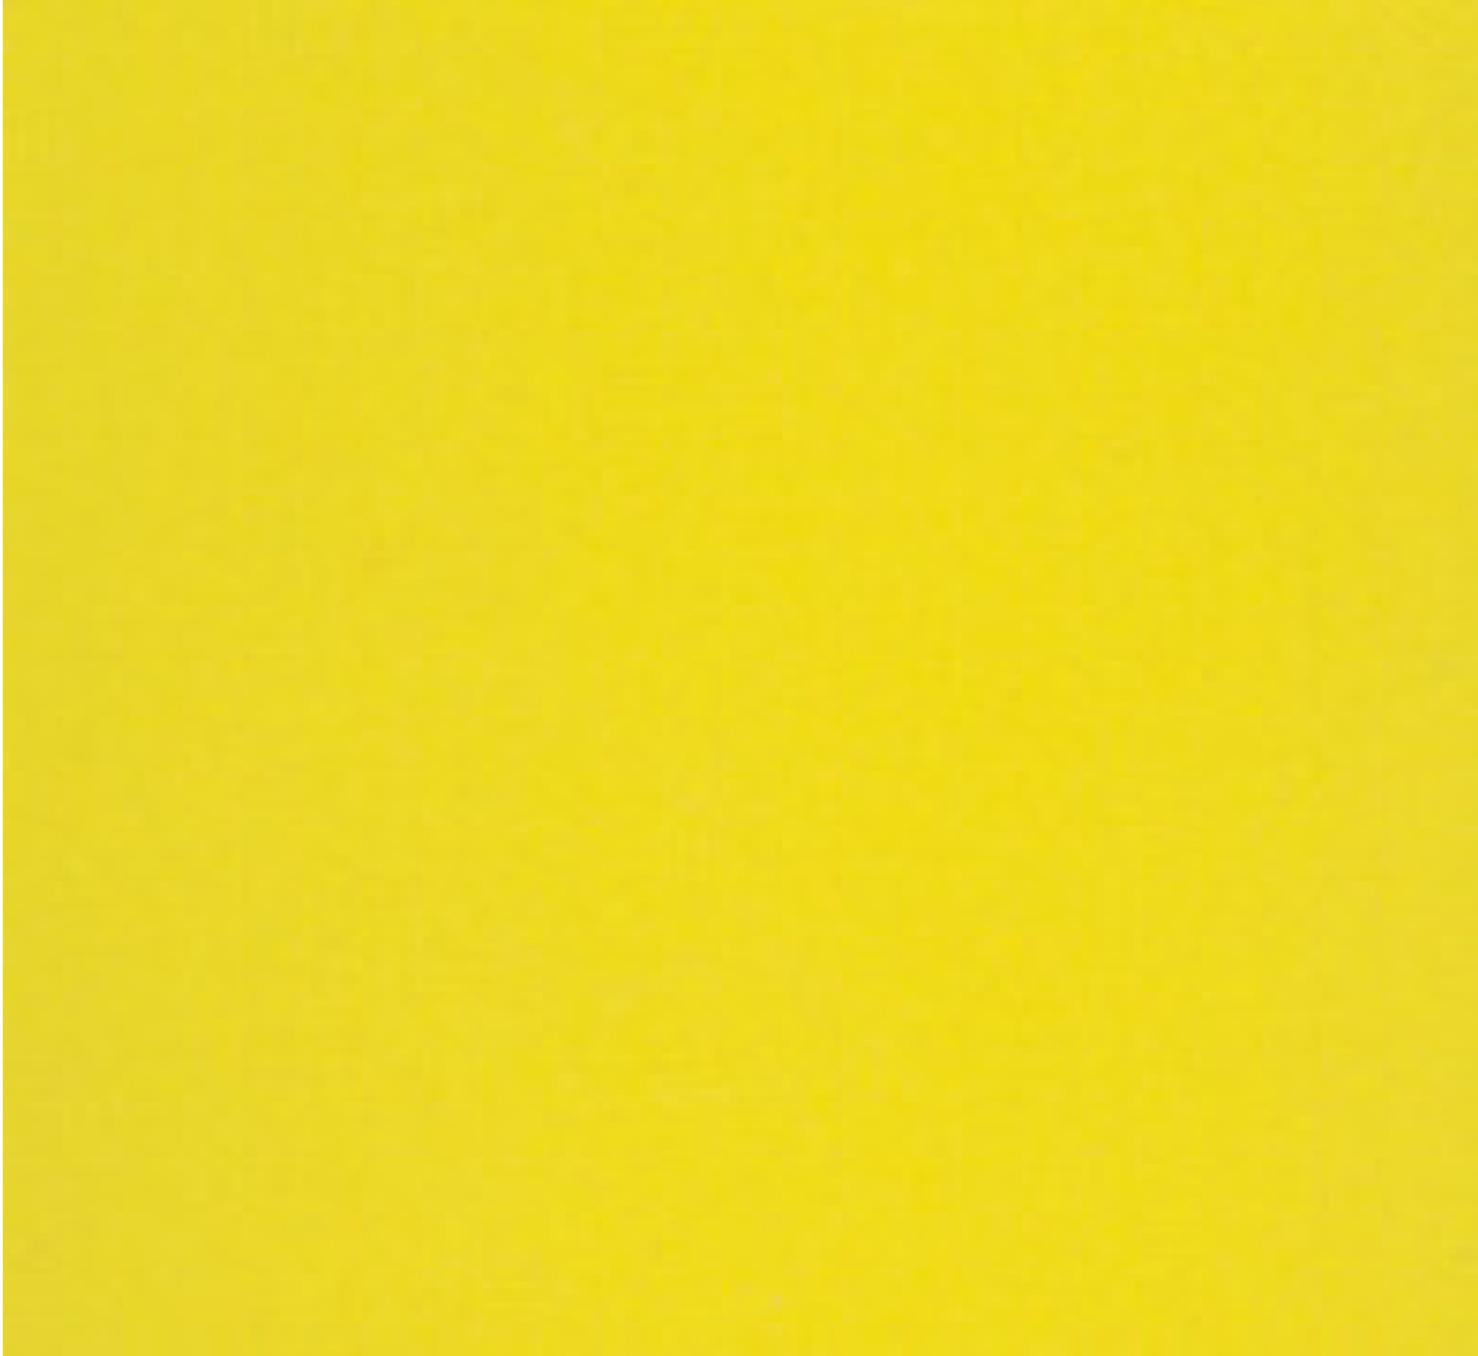 Simplicity Bright Yellow 270